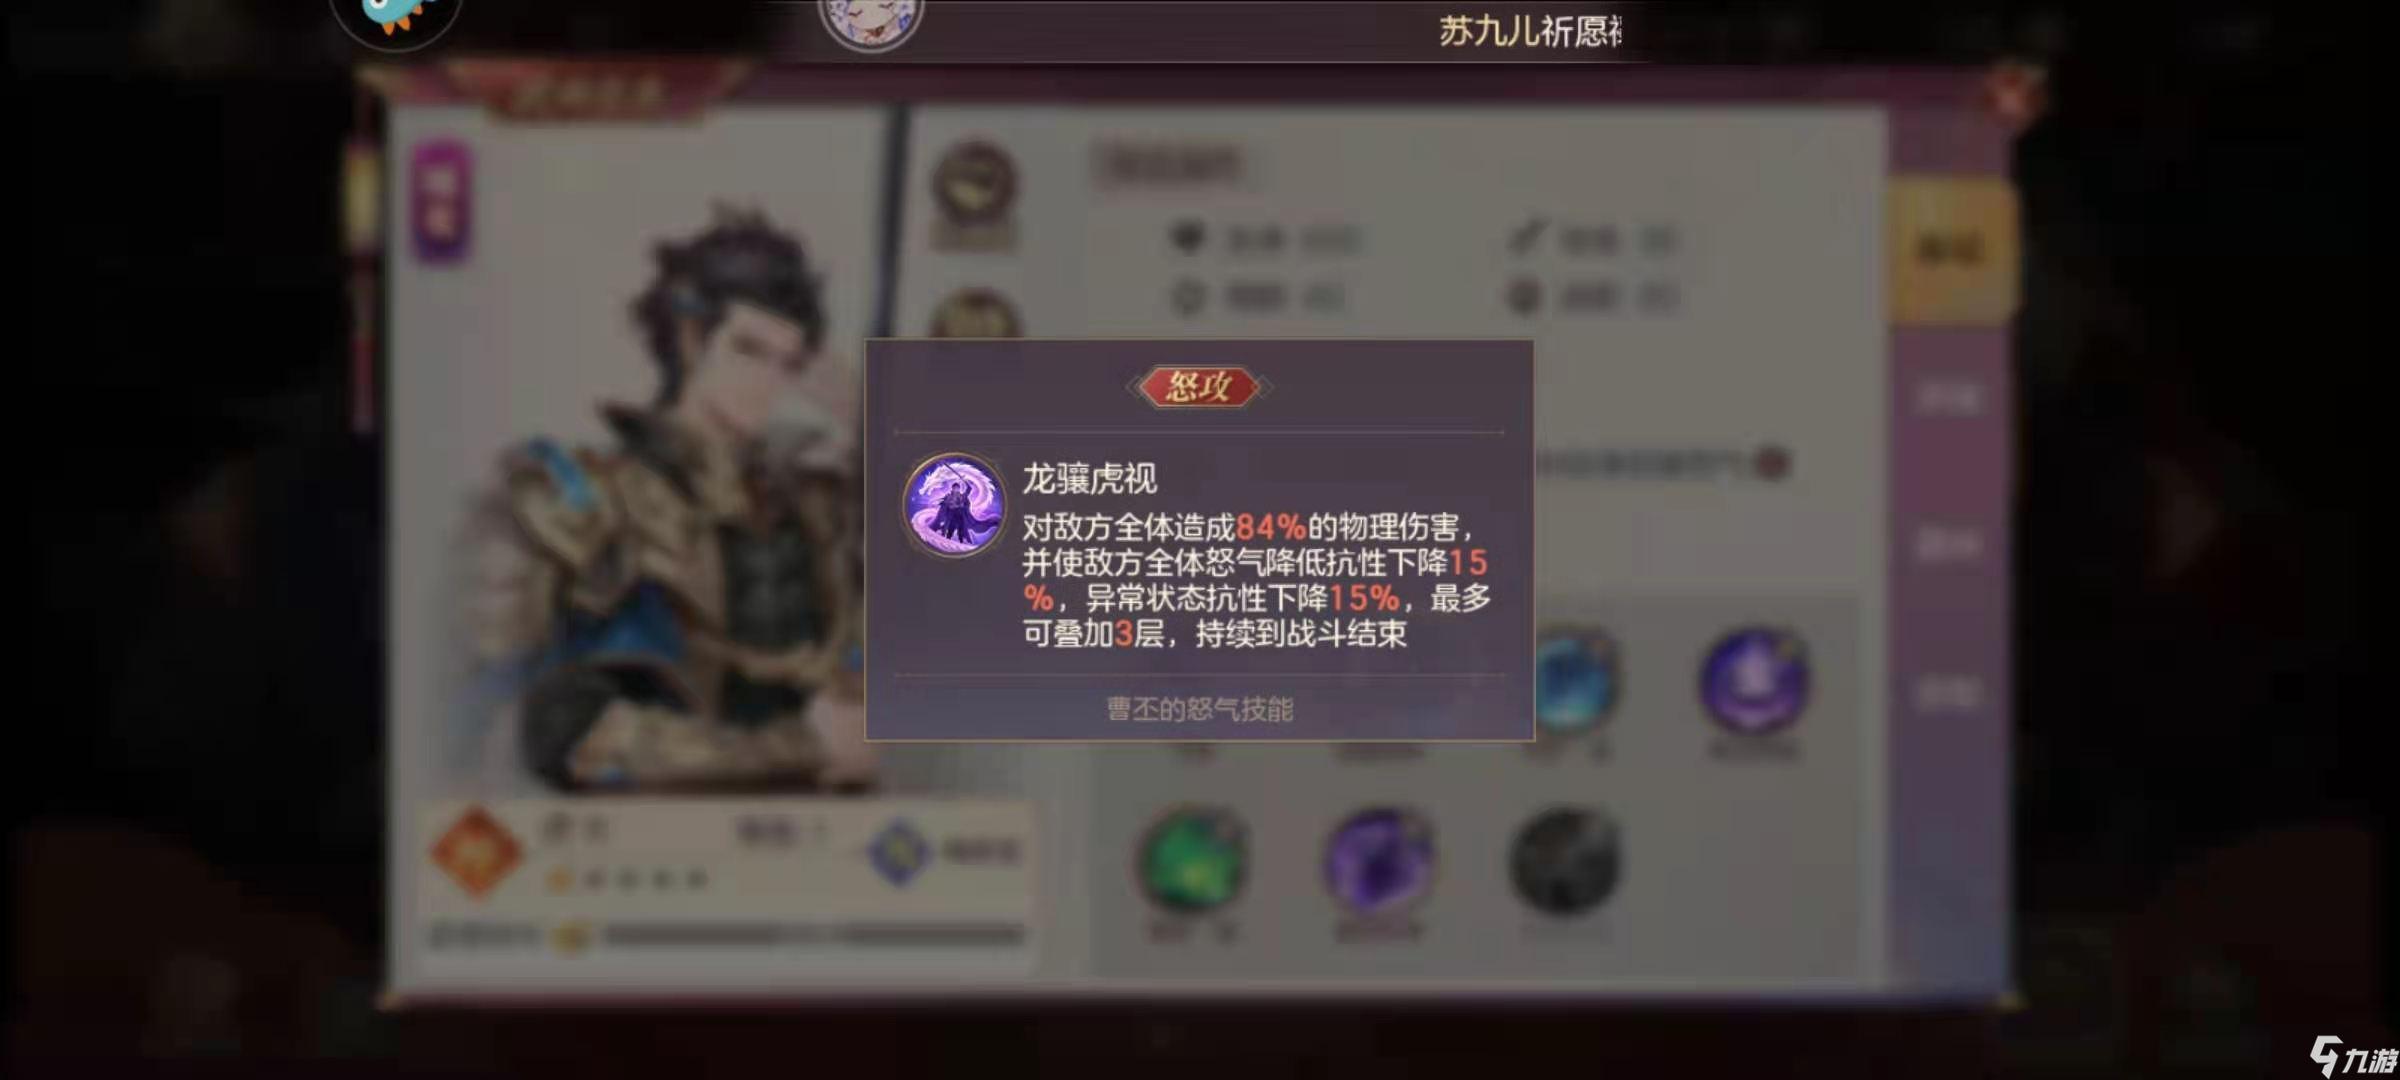 http://f1.benshouji.com/image/2021/0225/161423388898471.jpg